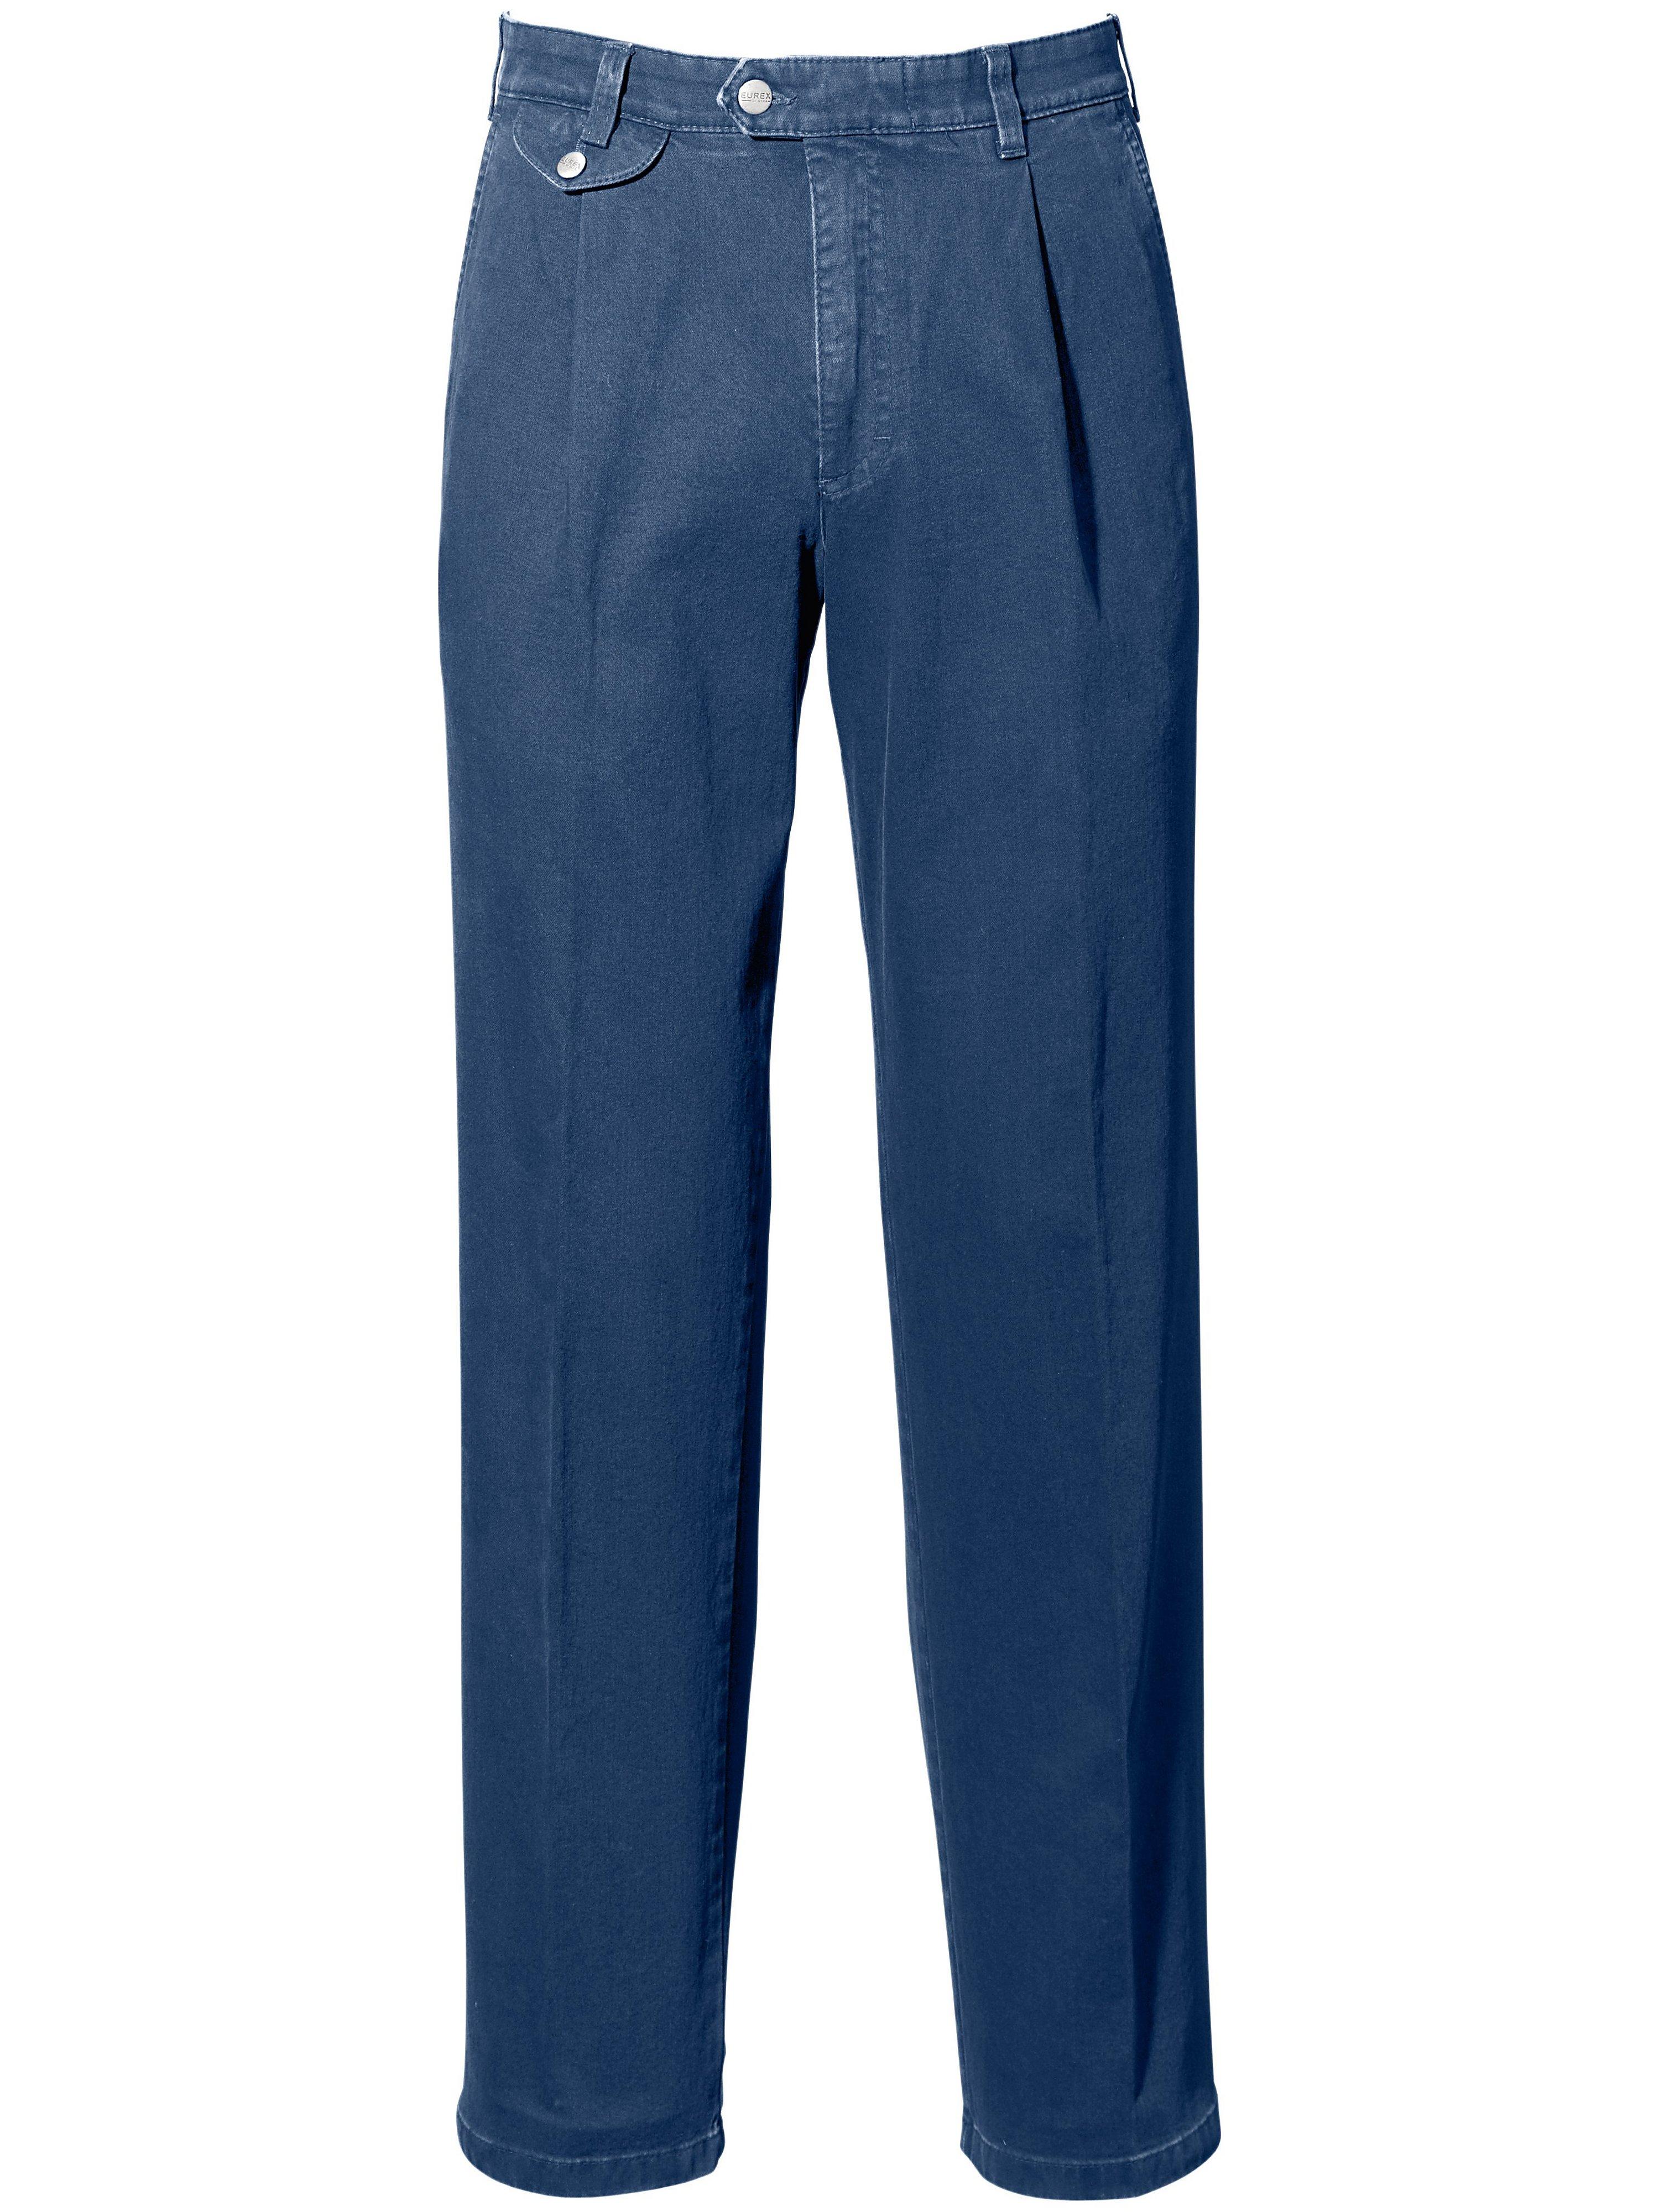 Bandplooi-jeans model Fred veiligheidszak Van Eurex by Brax denim